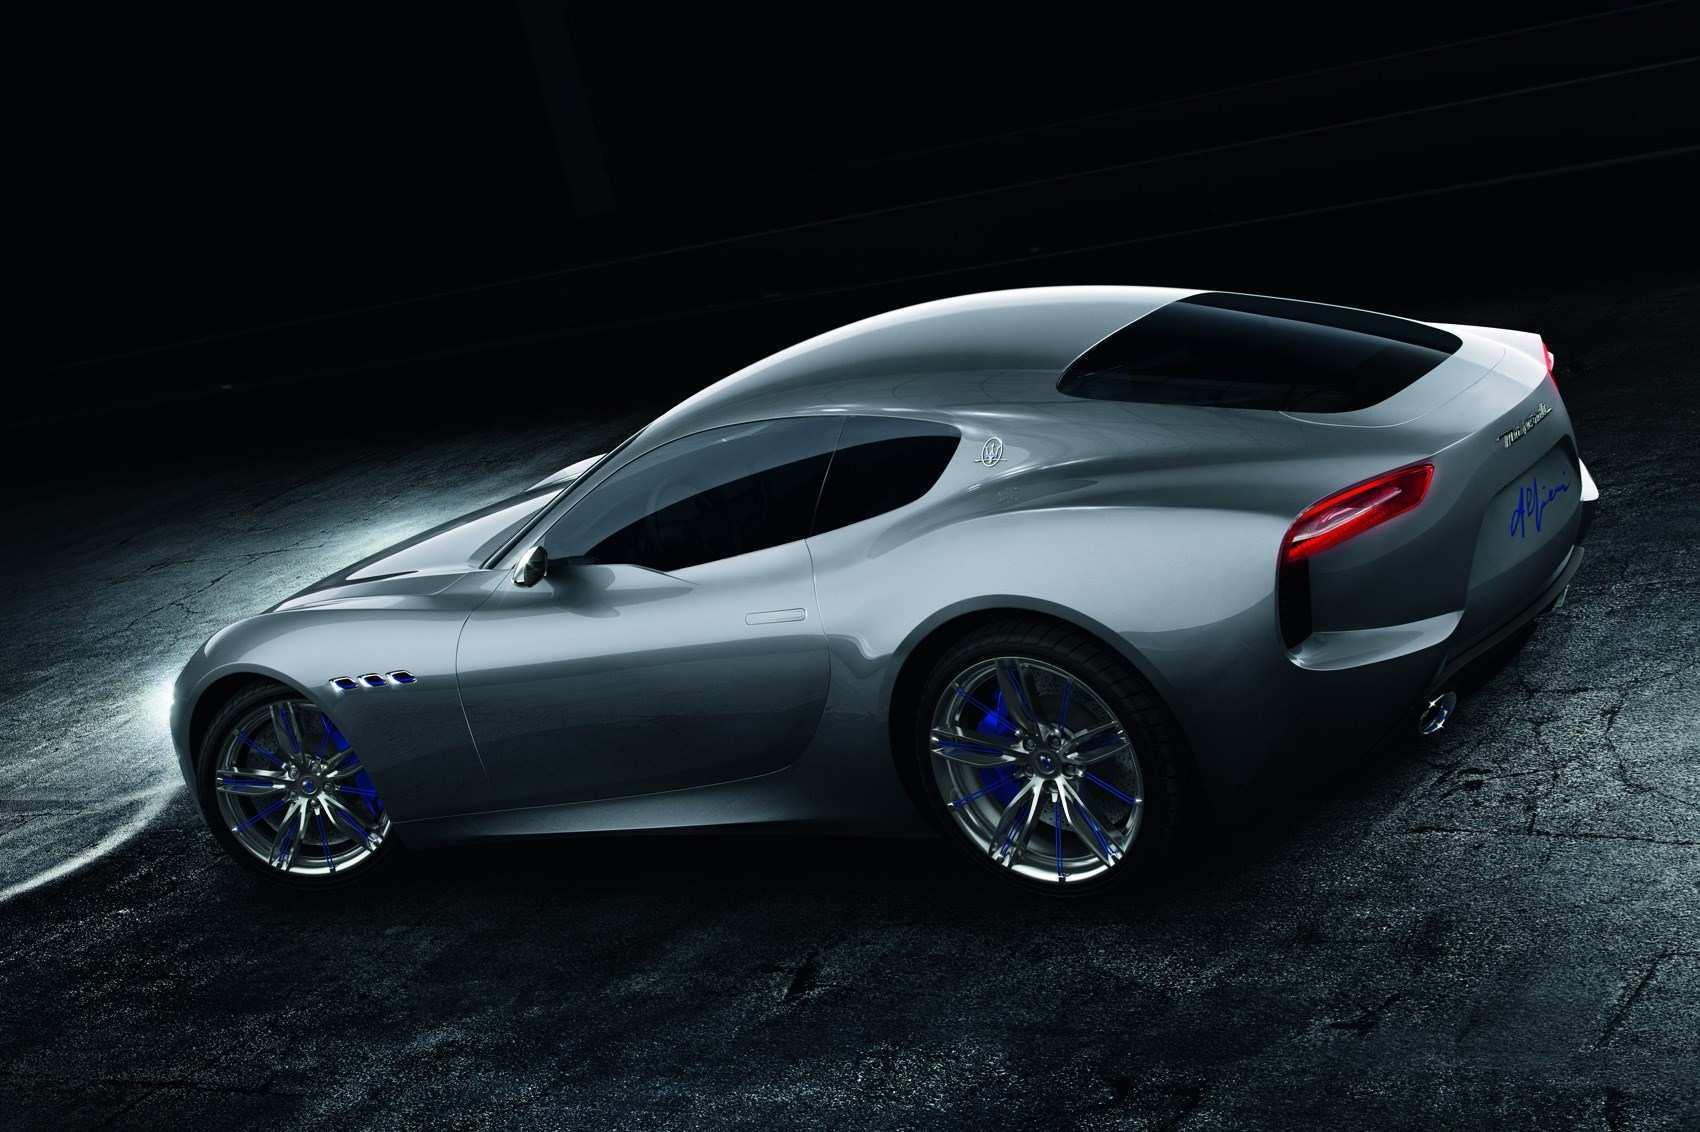 35 The 2020 Maserati Quattroportes Images by 2020 Maserati Quattroportes